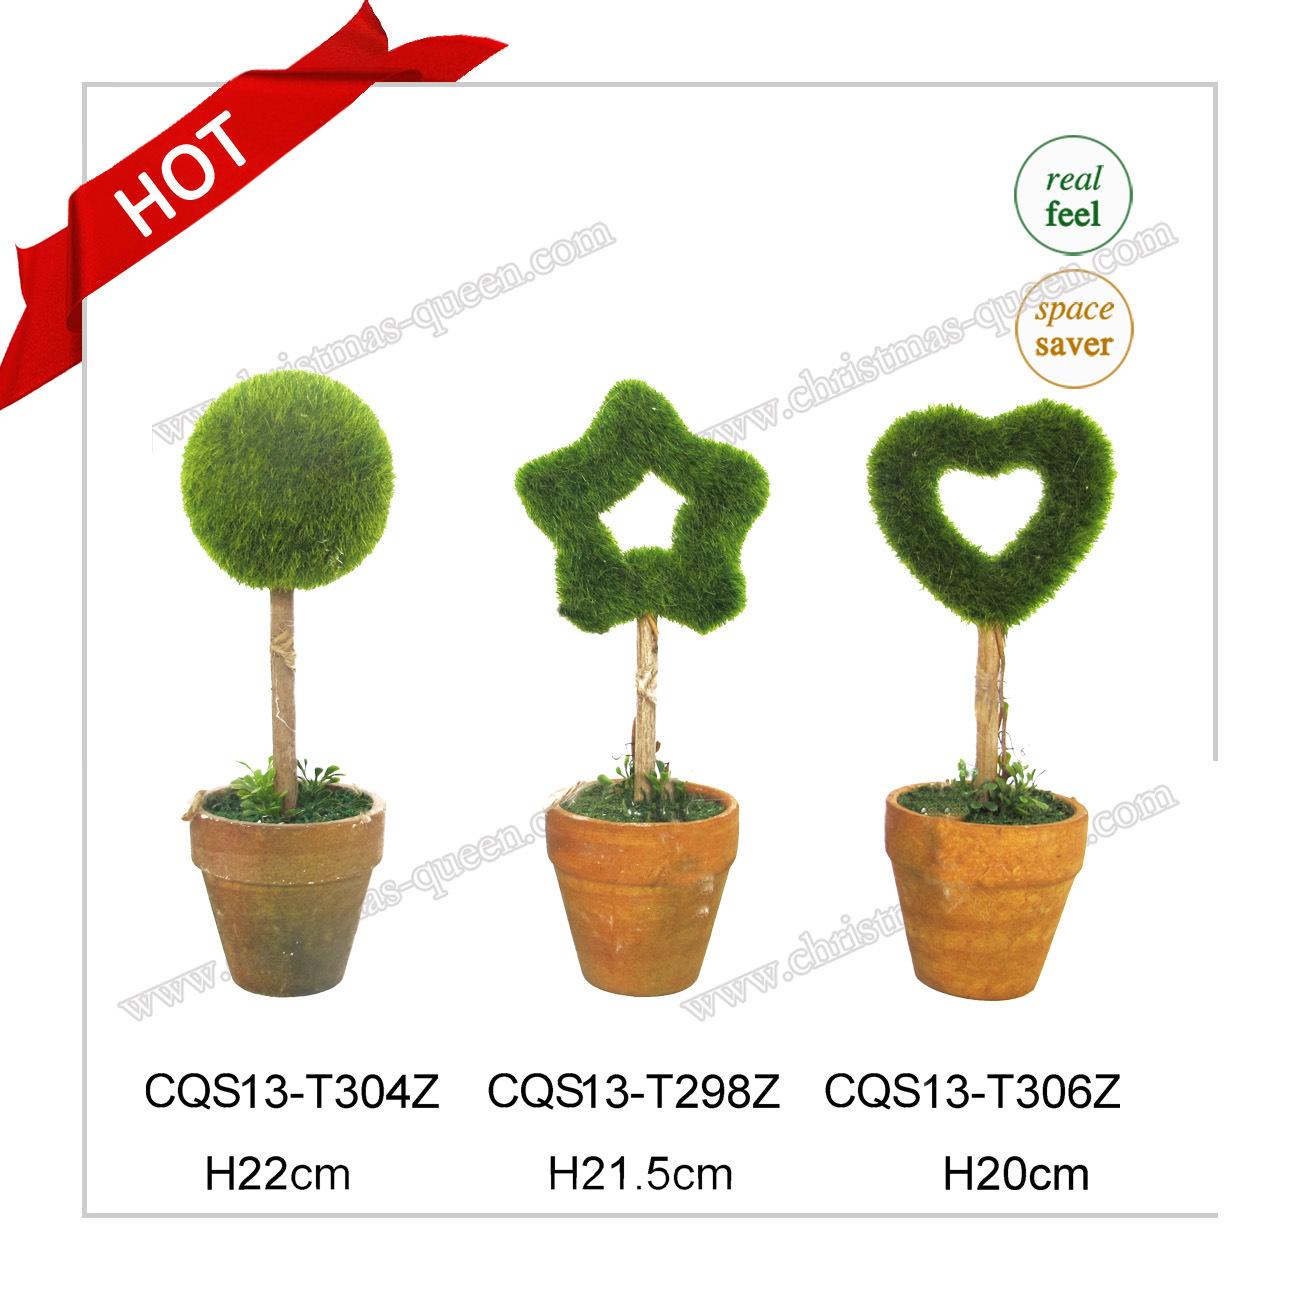 10-18cm Plastic Small Plant Pots Artificial Bonsai